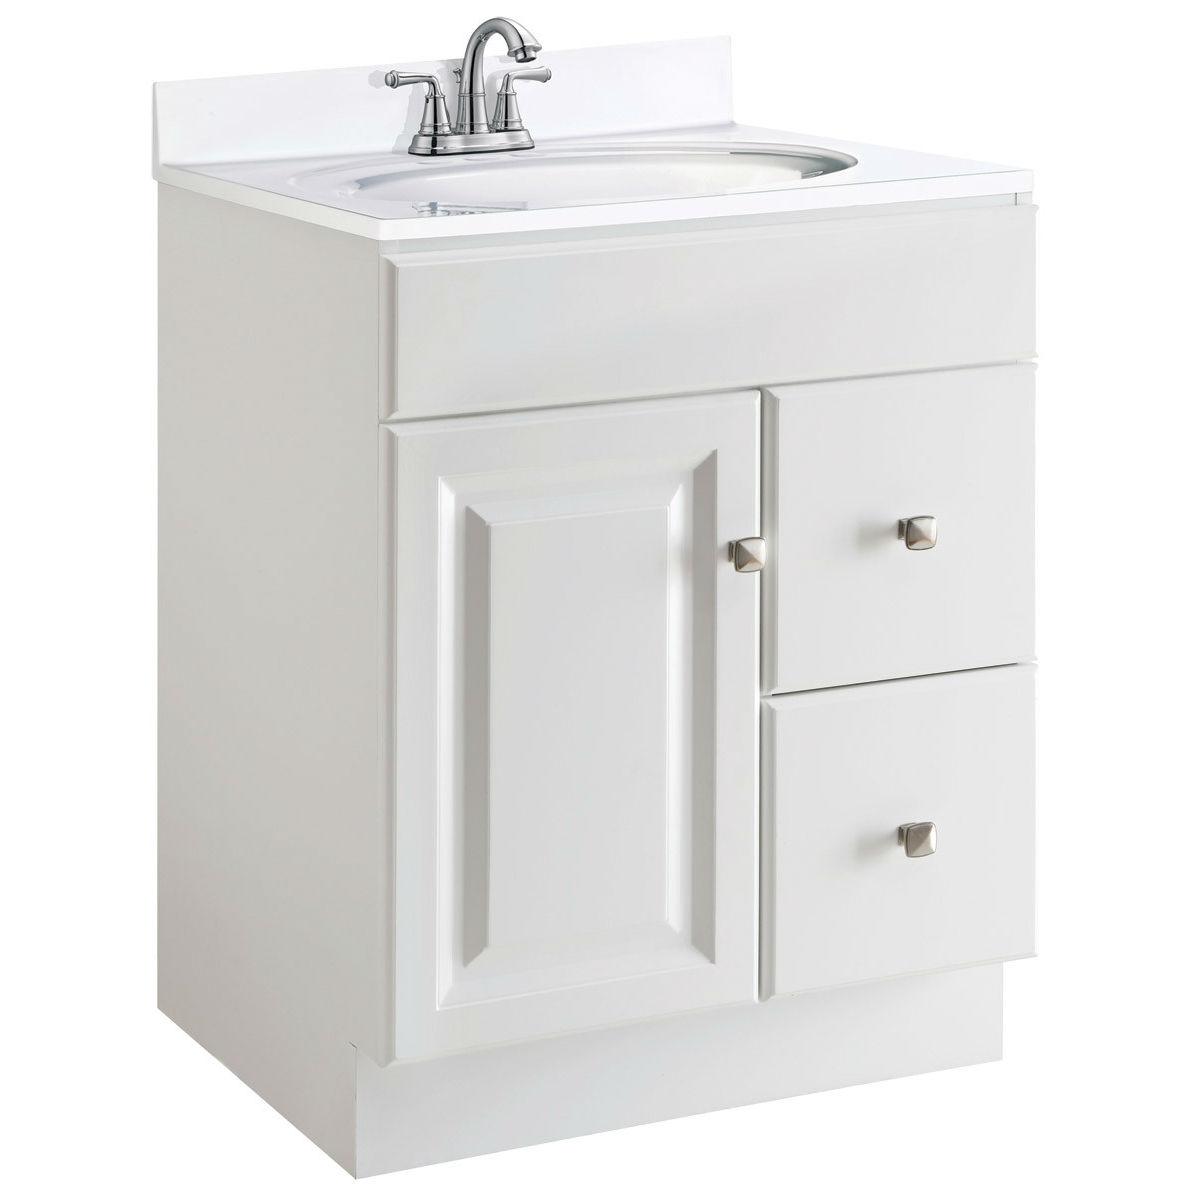 24inch Modern Bathroom Vanity Cabinet Base in White Semi